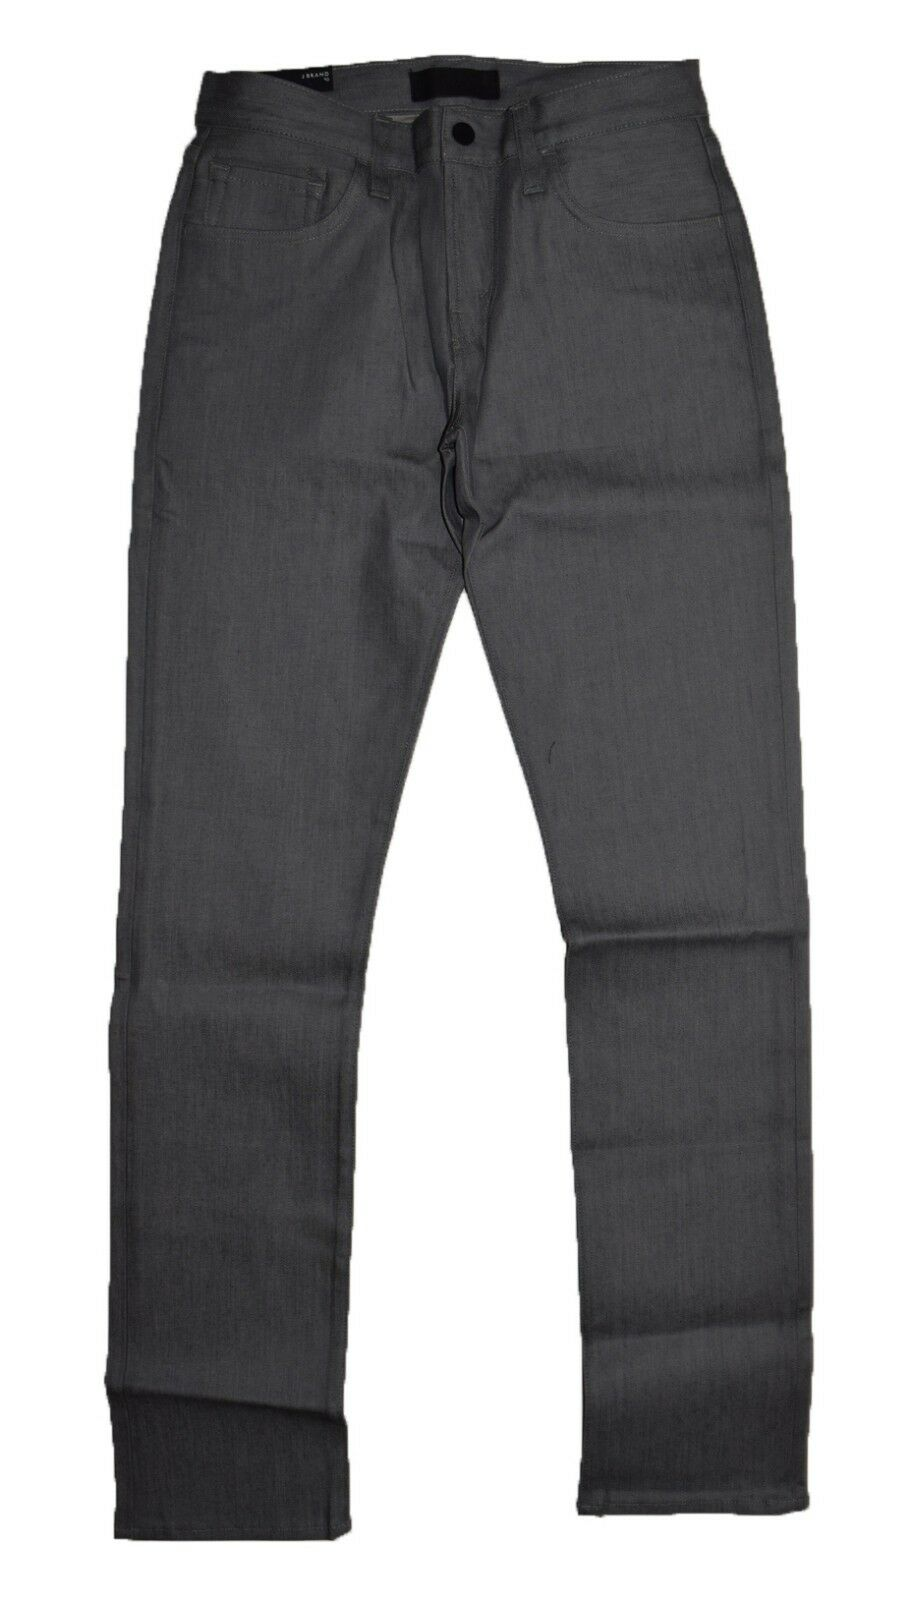 J Brand Tyler Mens Jeans Slim Fit Raw Denim size 30 32 BNWT